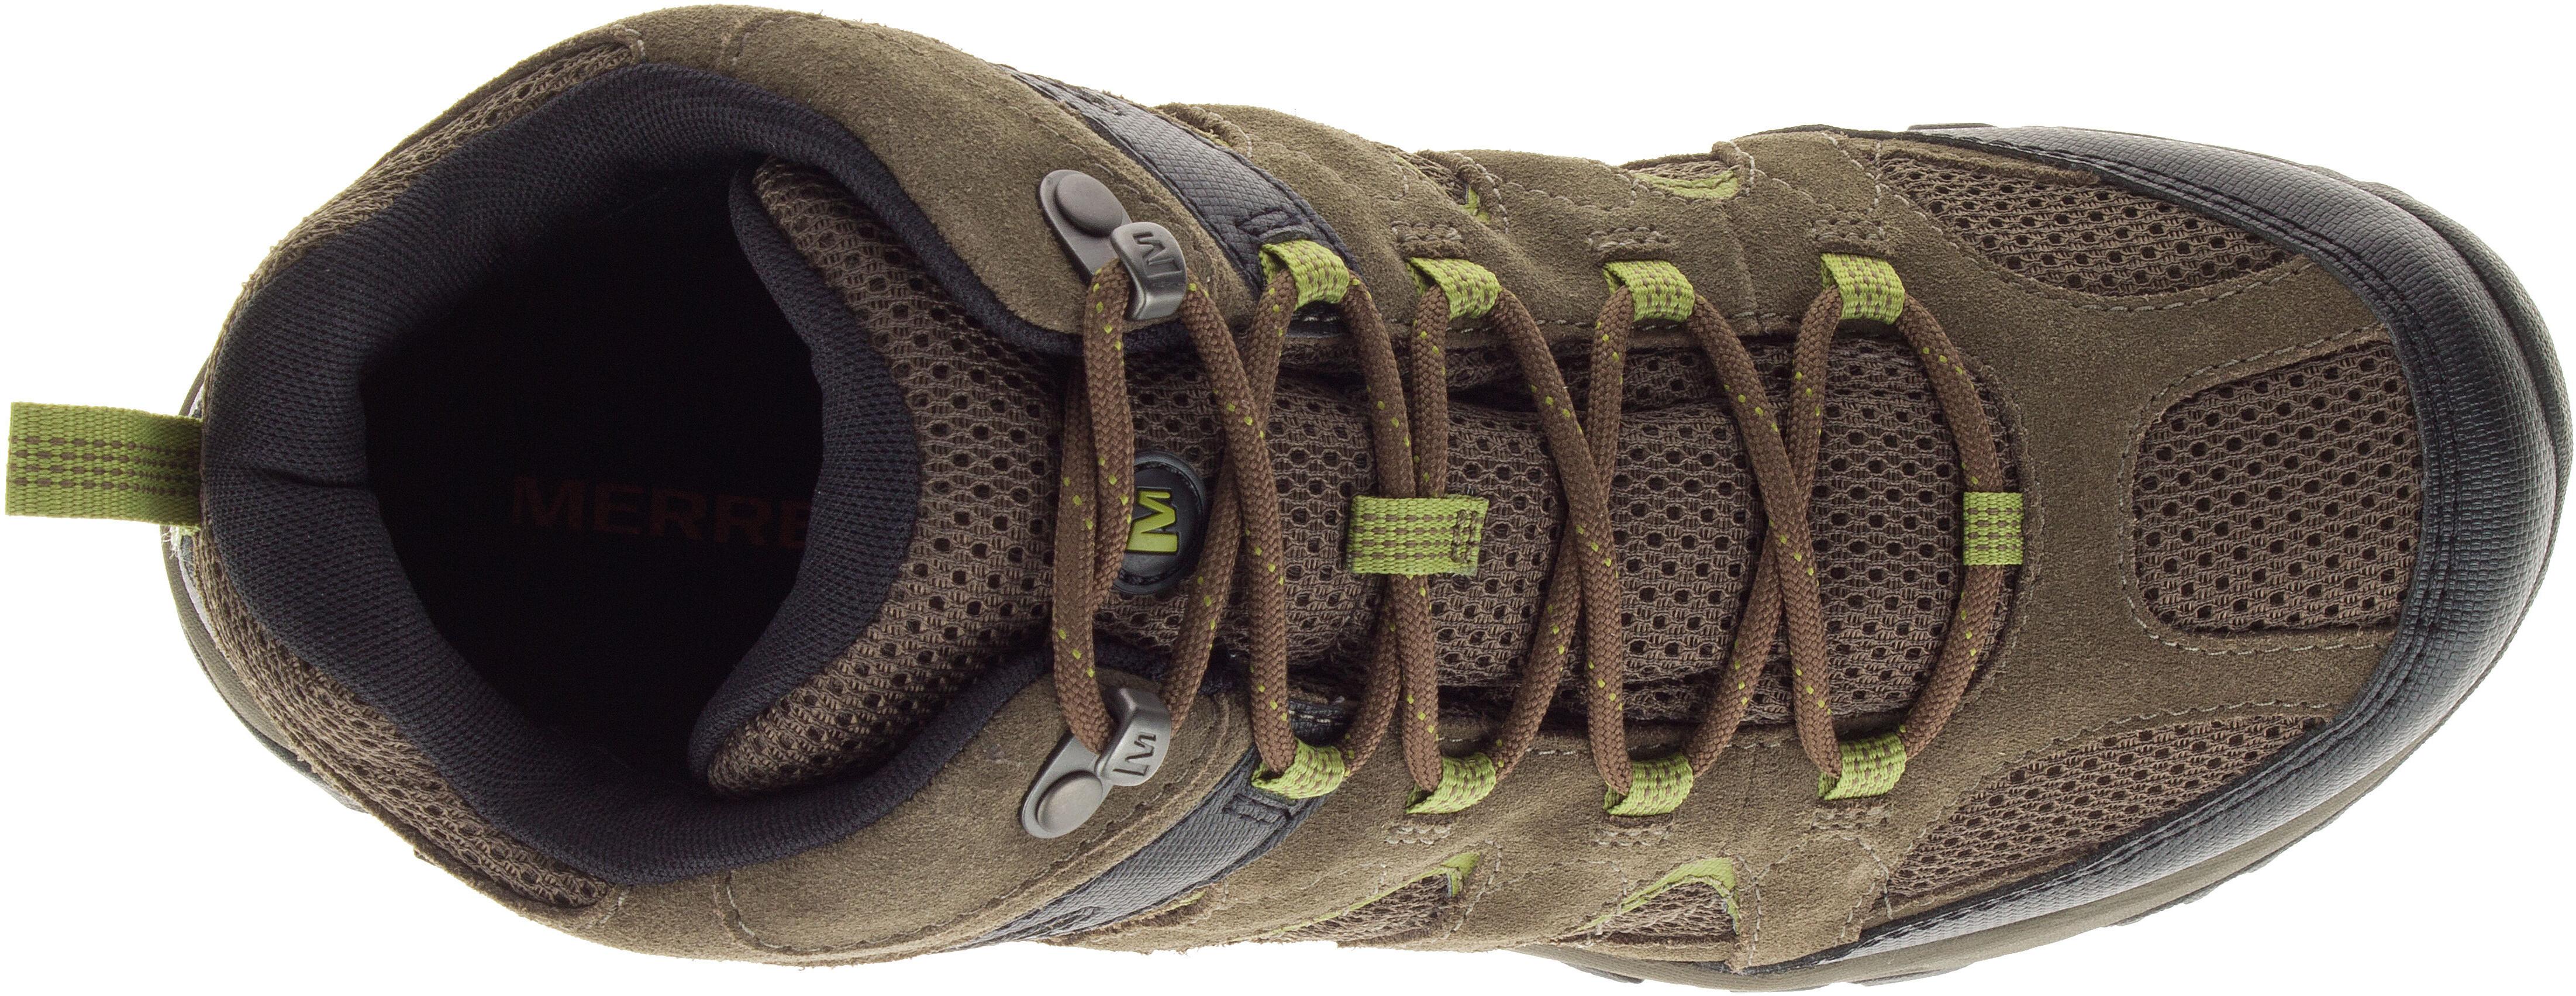 Merrell Outmost MID Vent GTX - Chaussures Homme - marron sur CAMPZ ! e5142dcaa0c